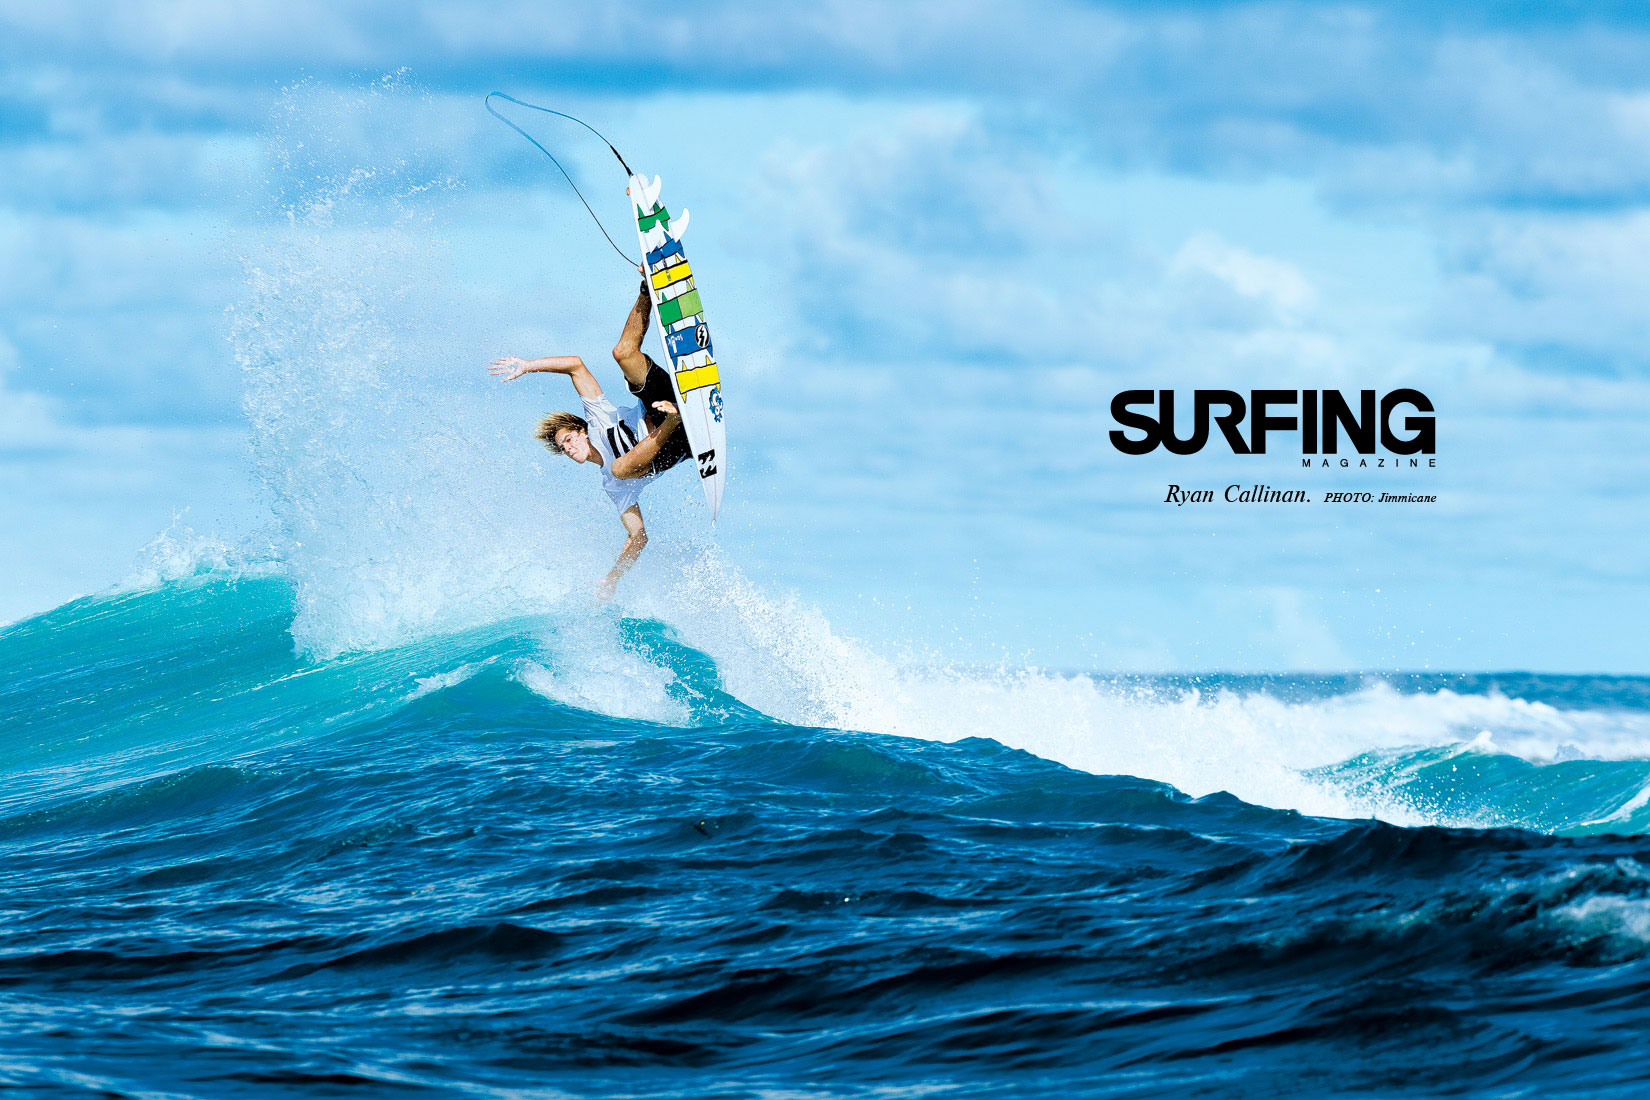 September 2011 Issue Wallpaper SURFING Magazine 1650x1100